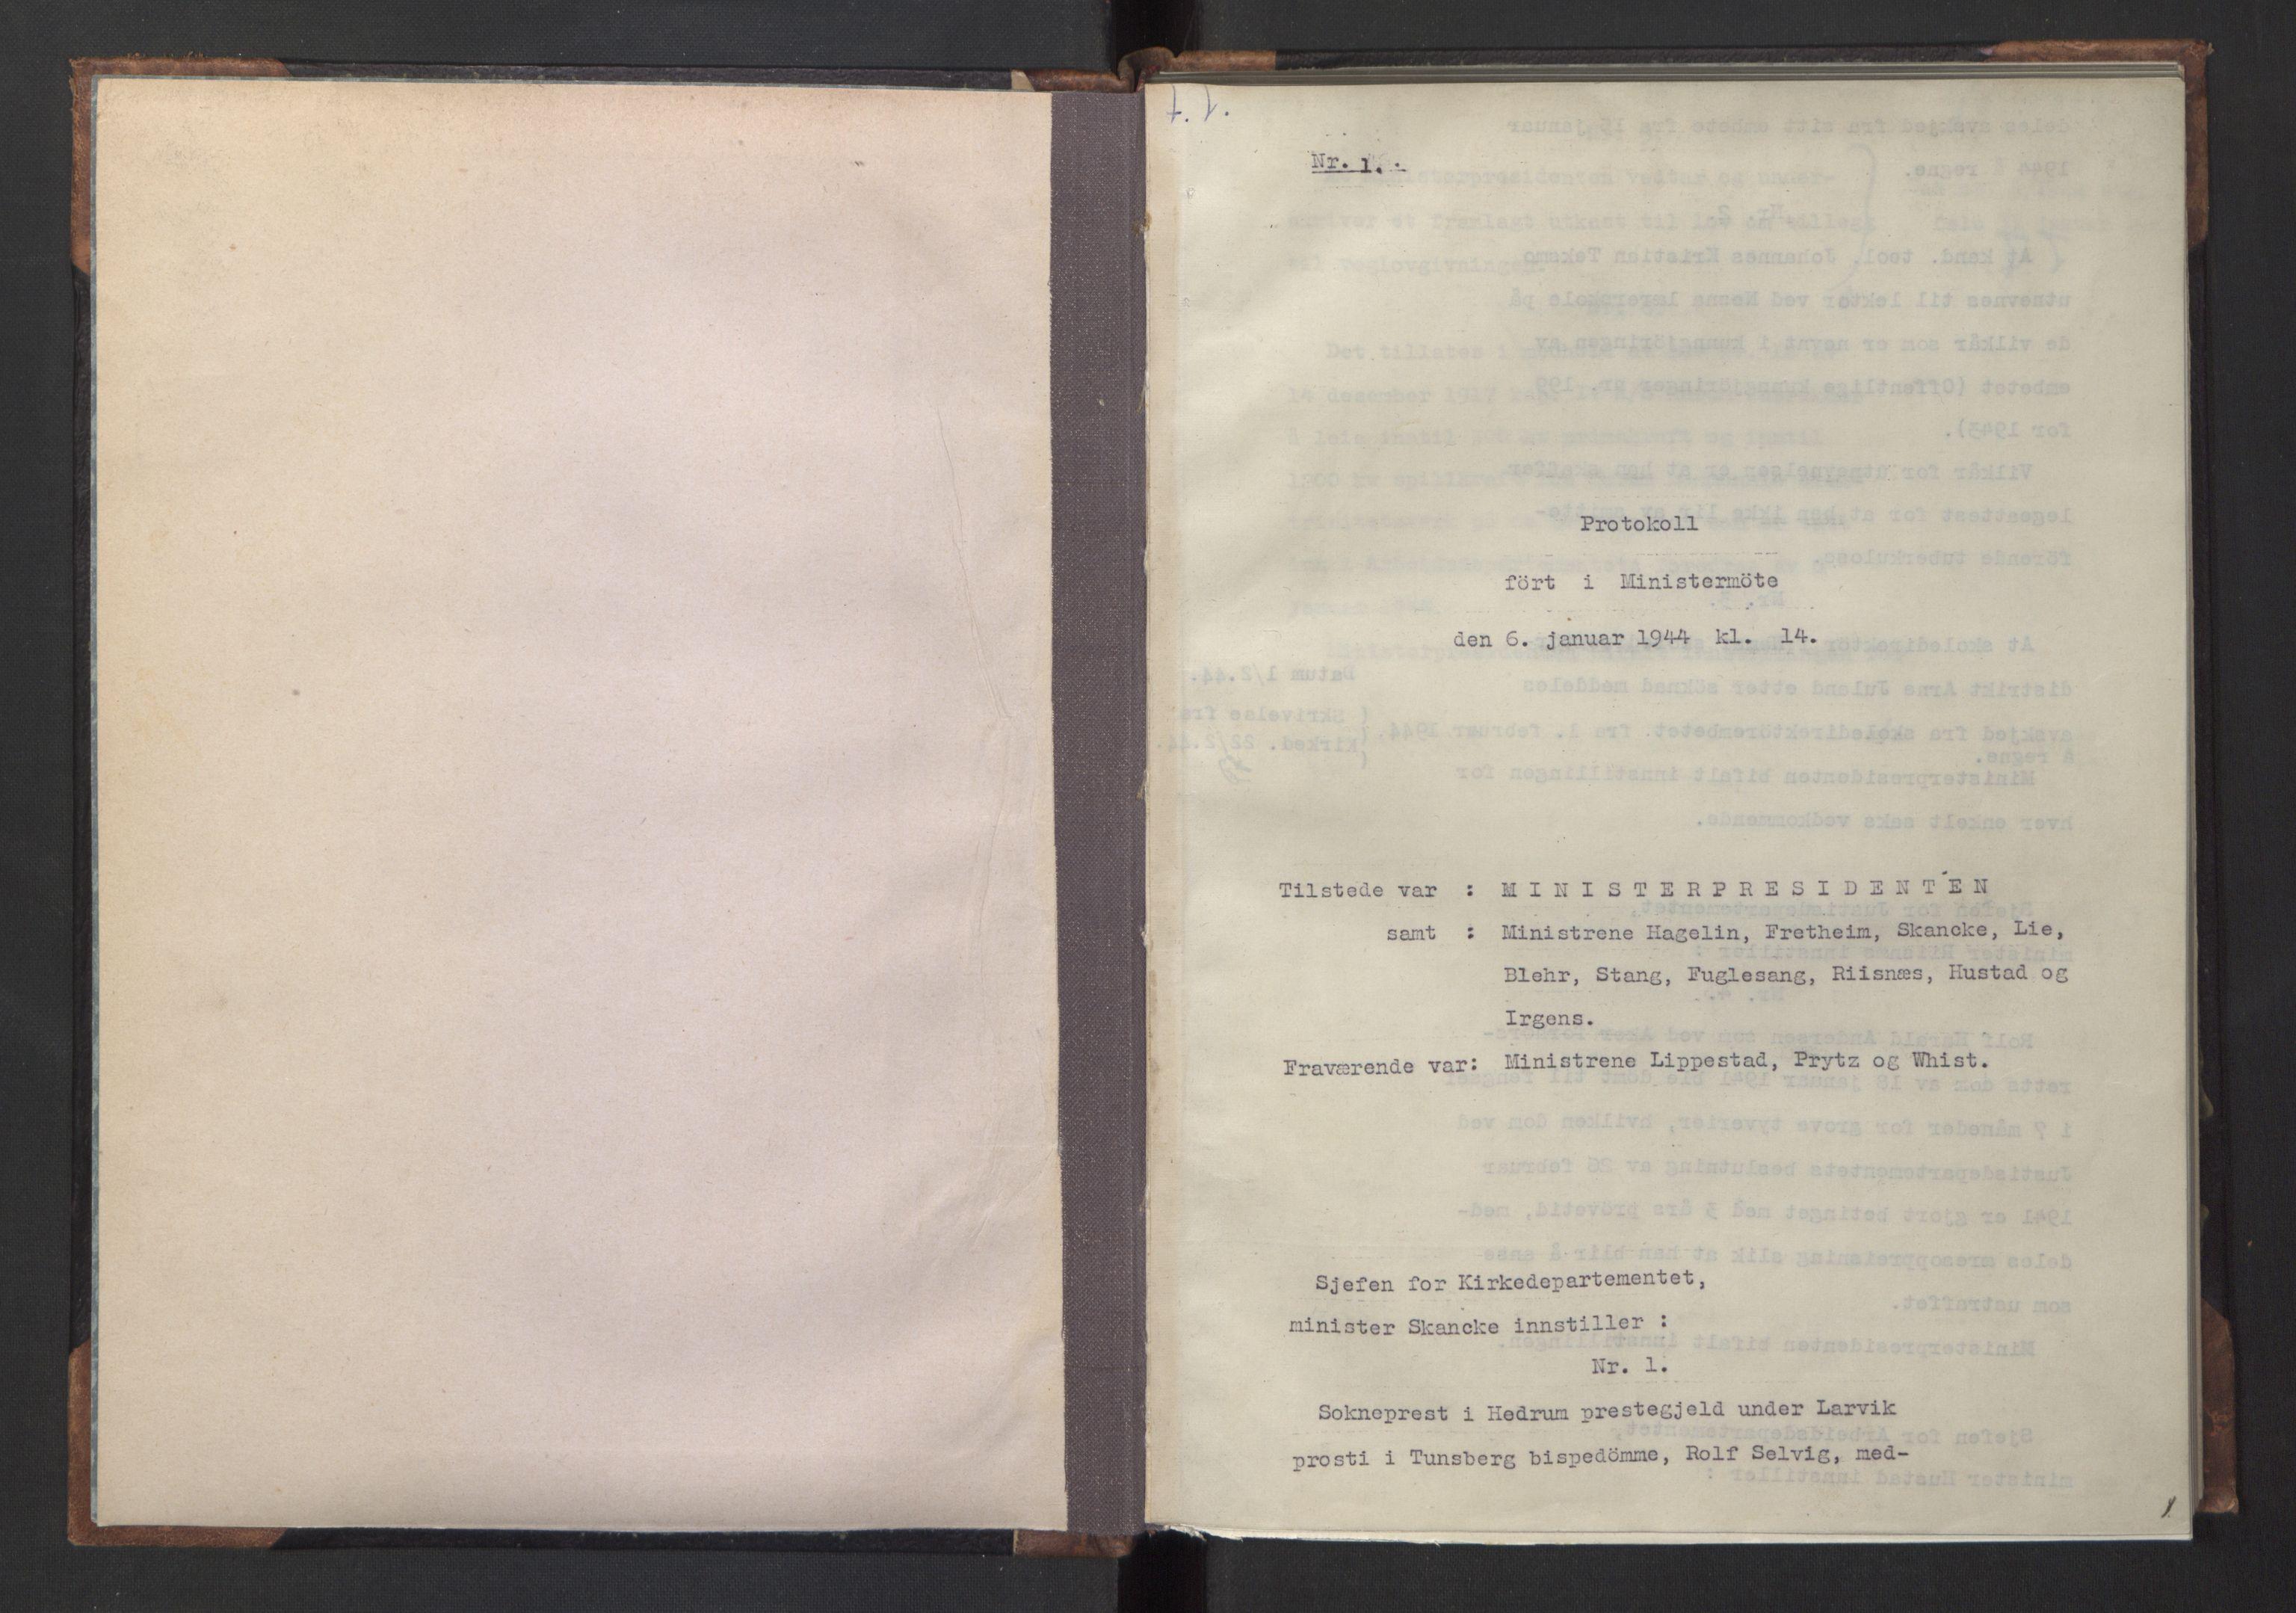 RA, NS-administrasjonen 1940-1945 (Statsrådsekretariatet, de kommisariske statsråder mm), D/Da/L0005: Protokoll fra ministermøter, 1944, s. 1a